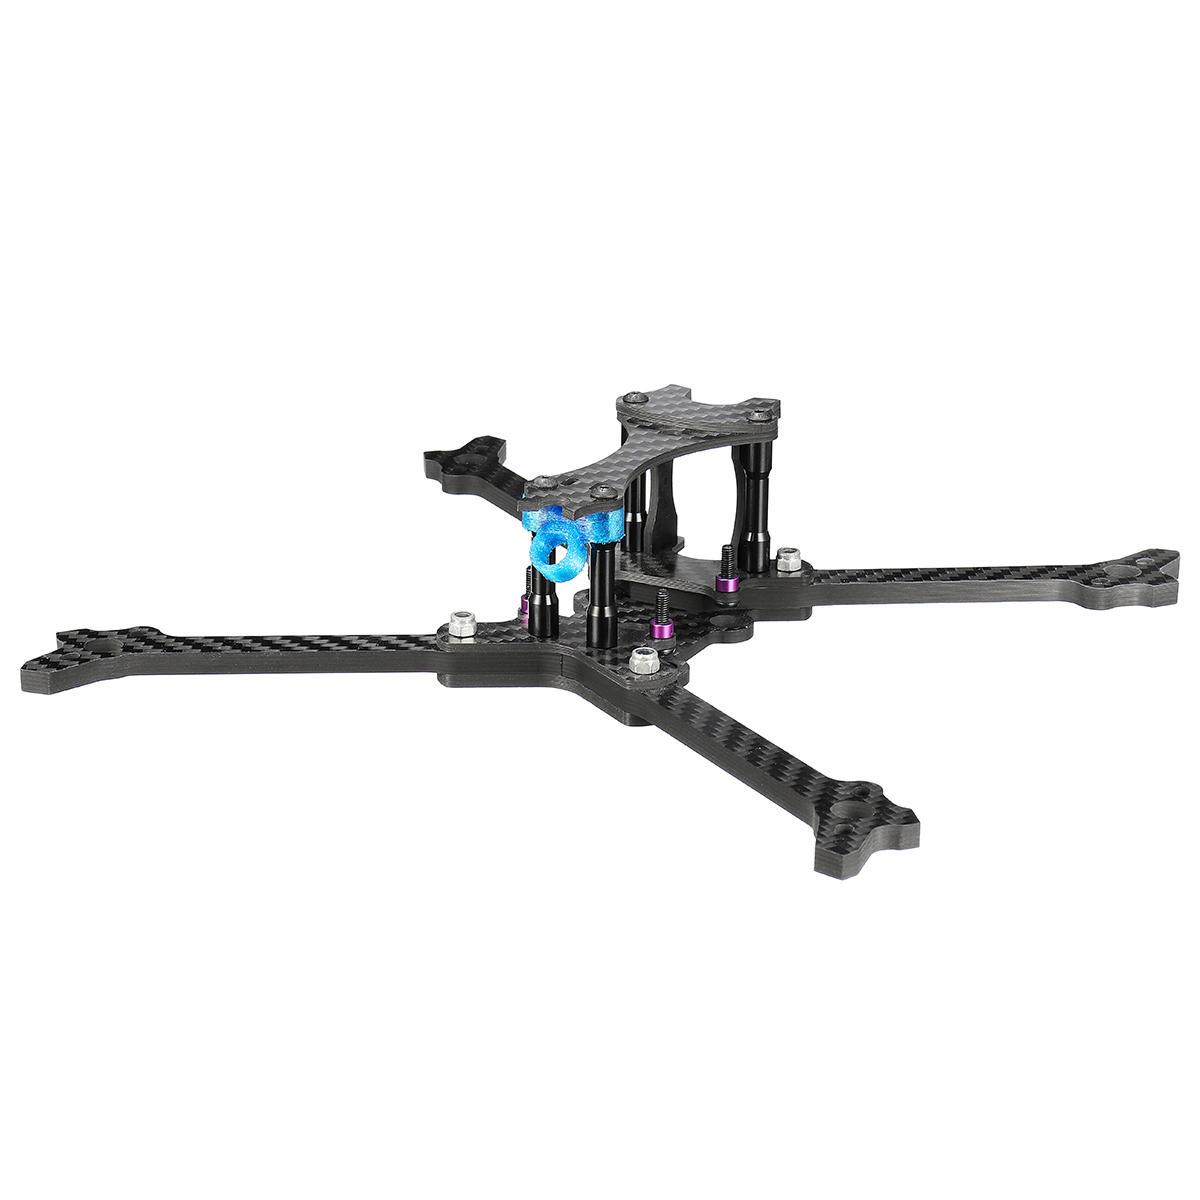 Uruav Nex220 220mm 5 Inch Frame Kit 5mm Arm Thickness W